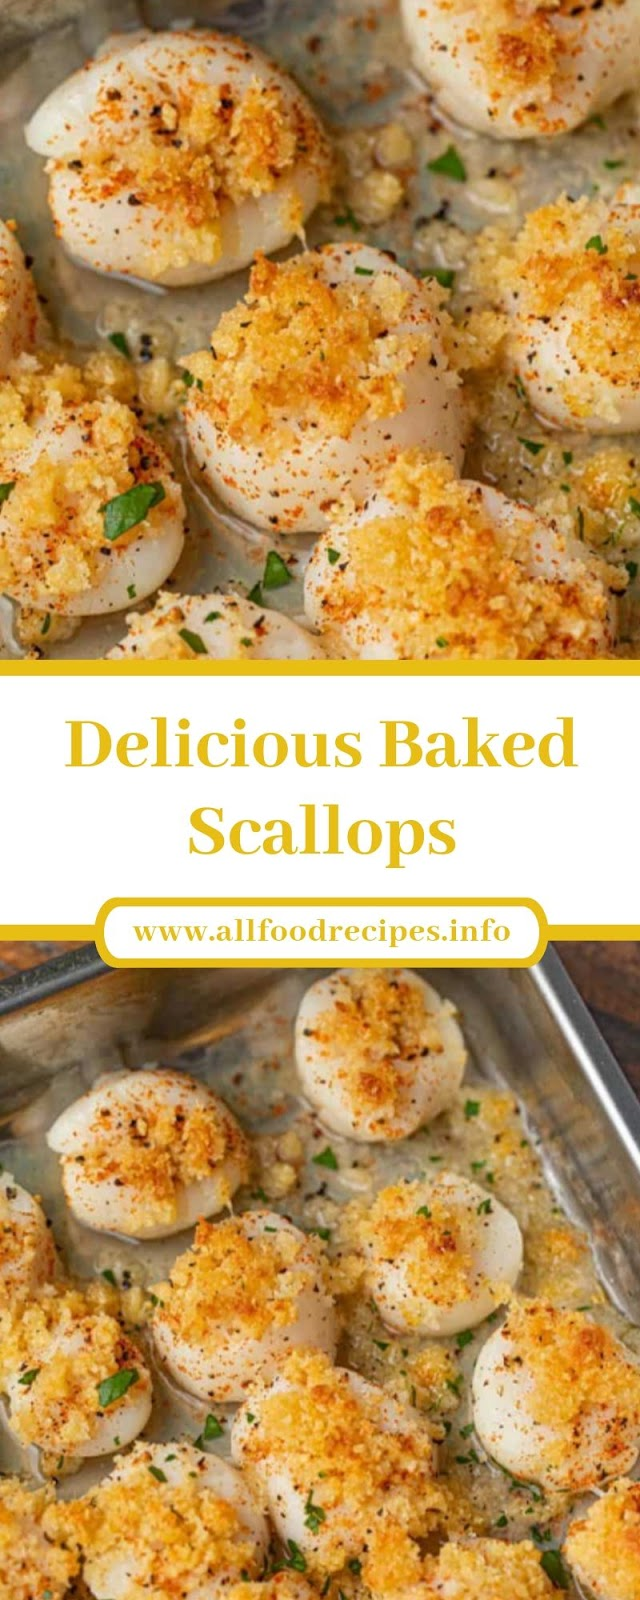 Delicious Baked Scallops